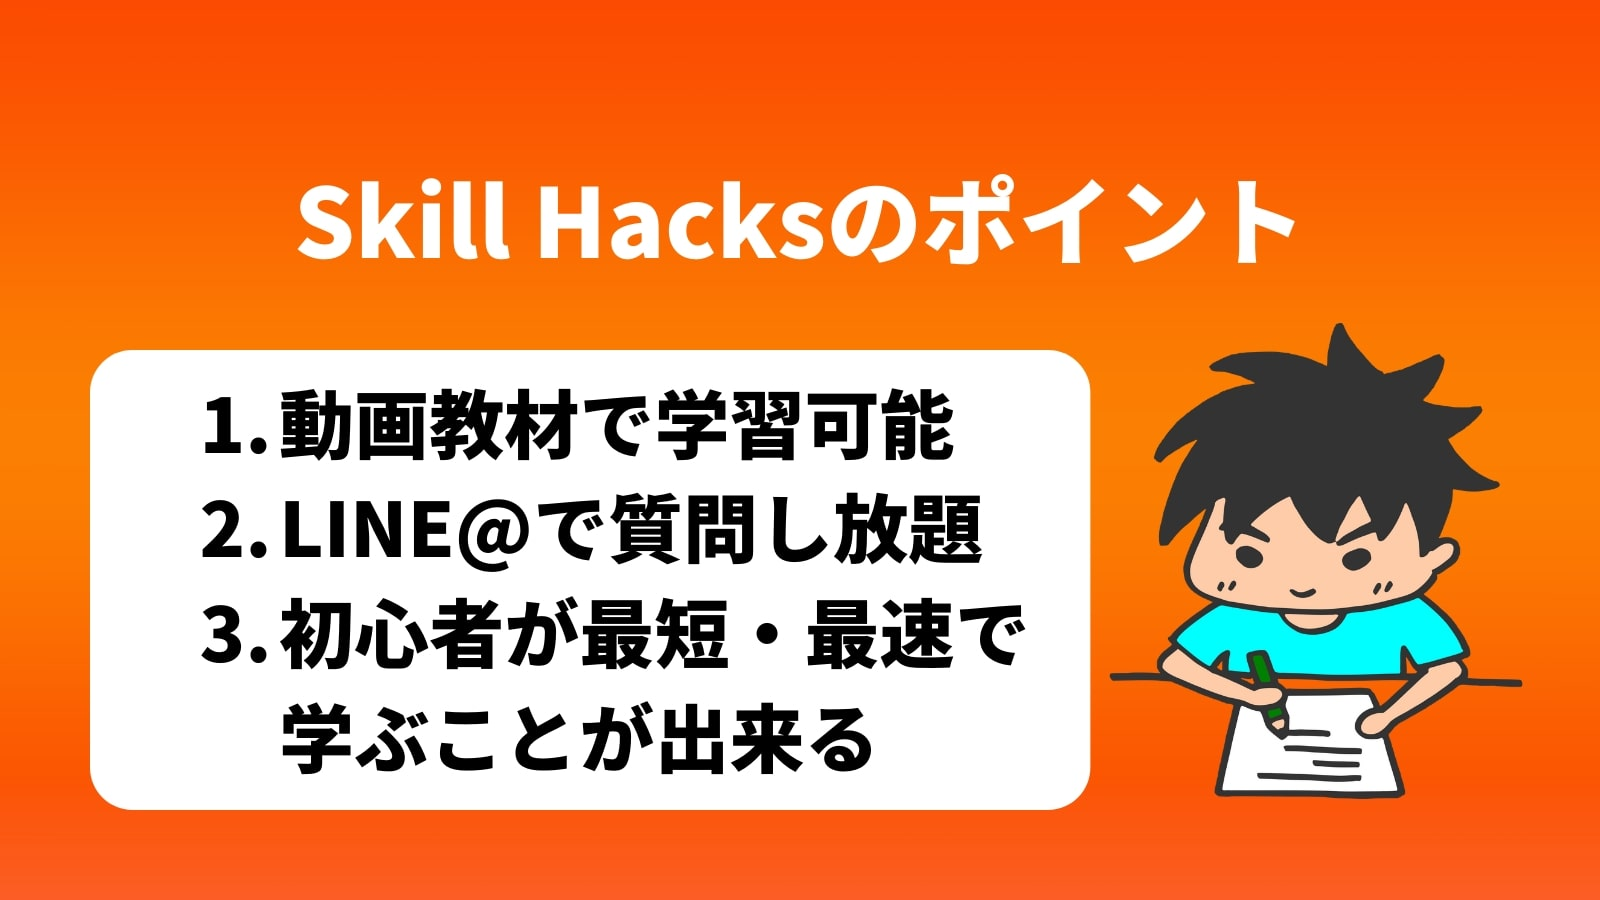 Skill Hacksのポイント